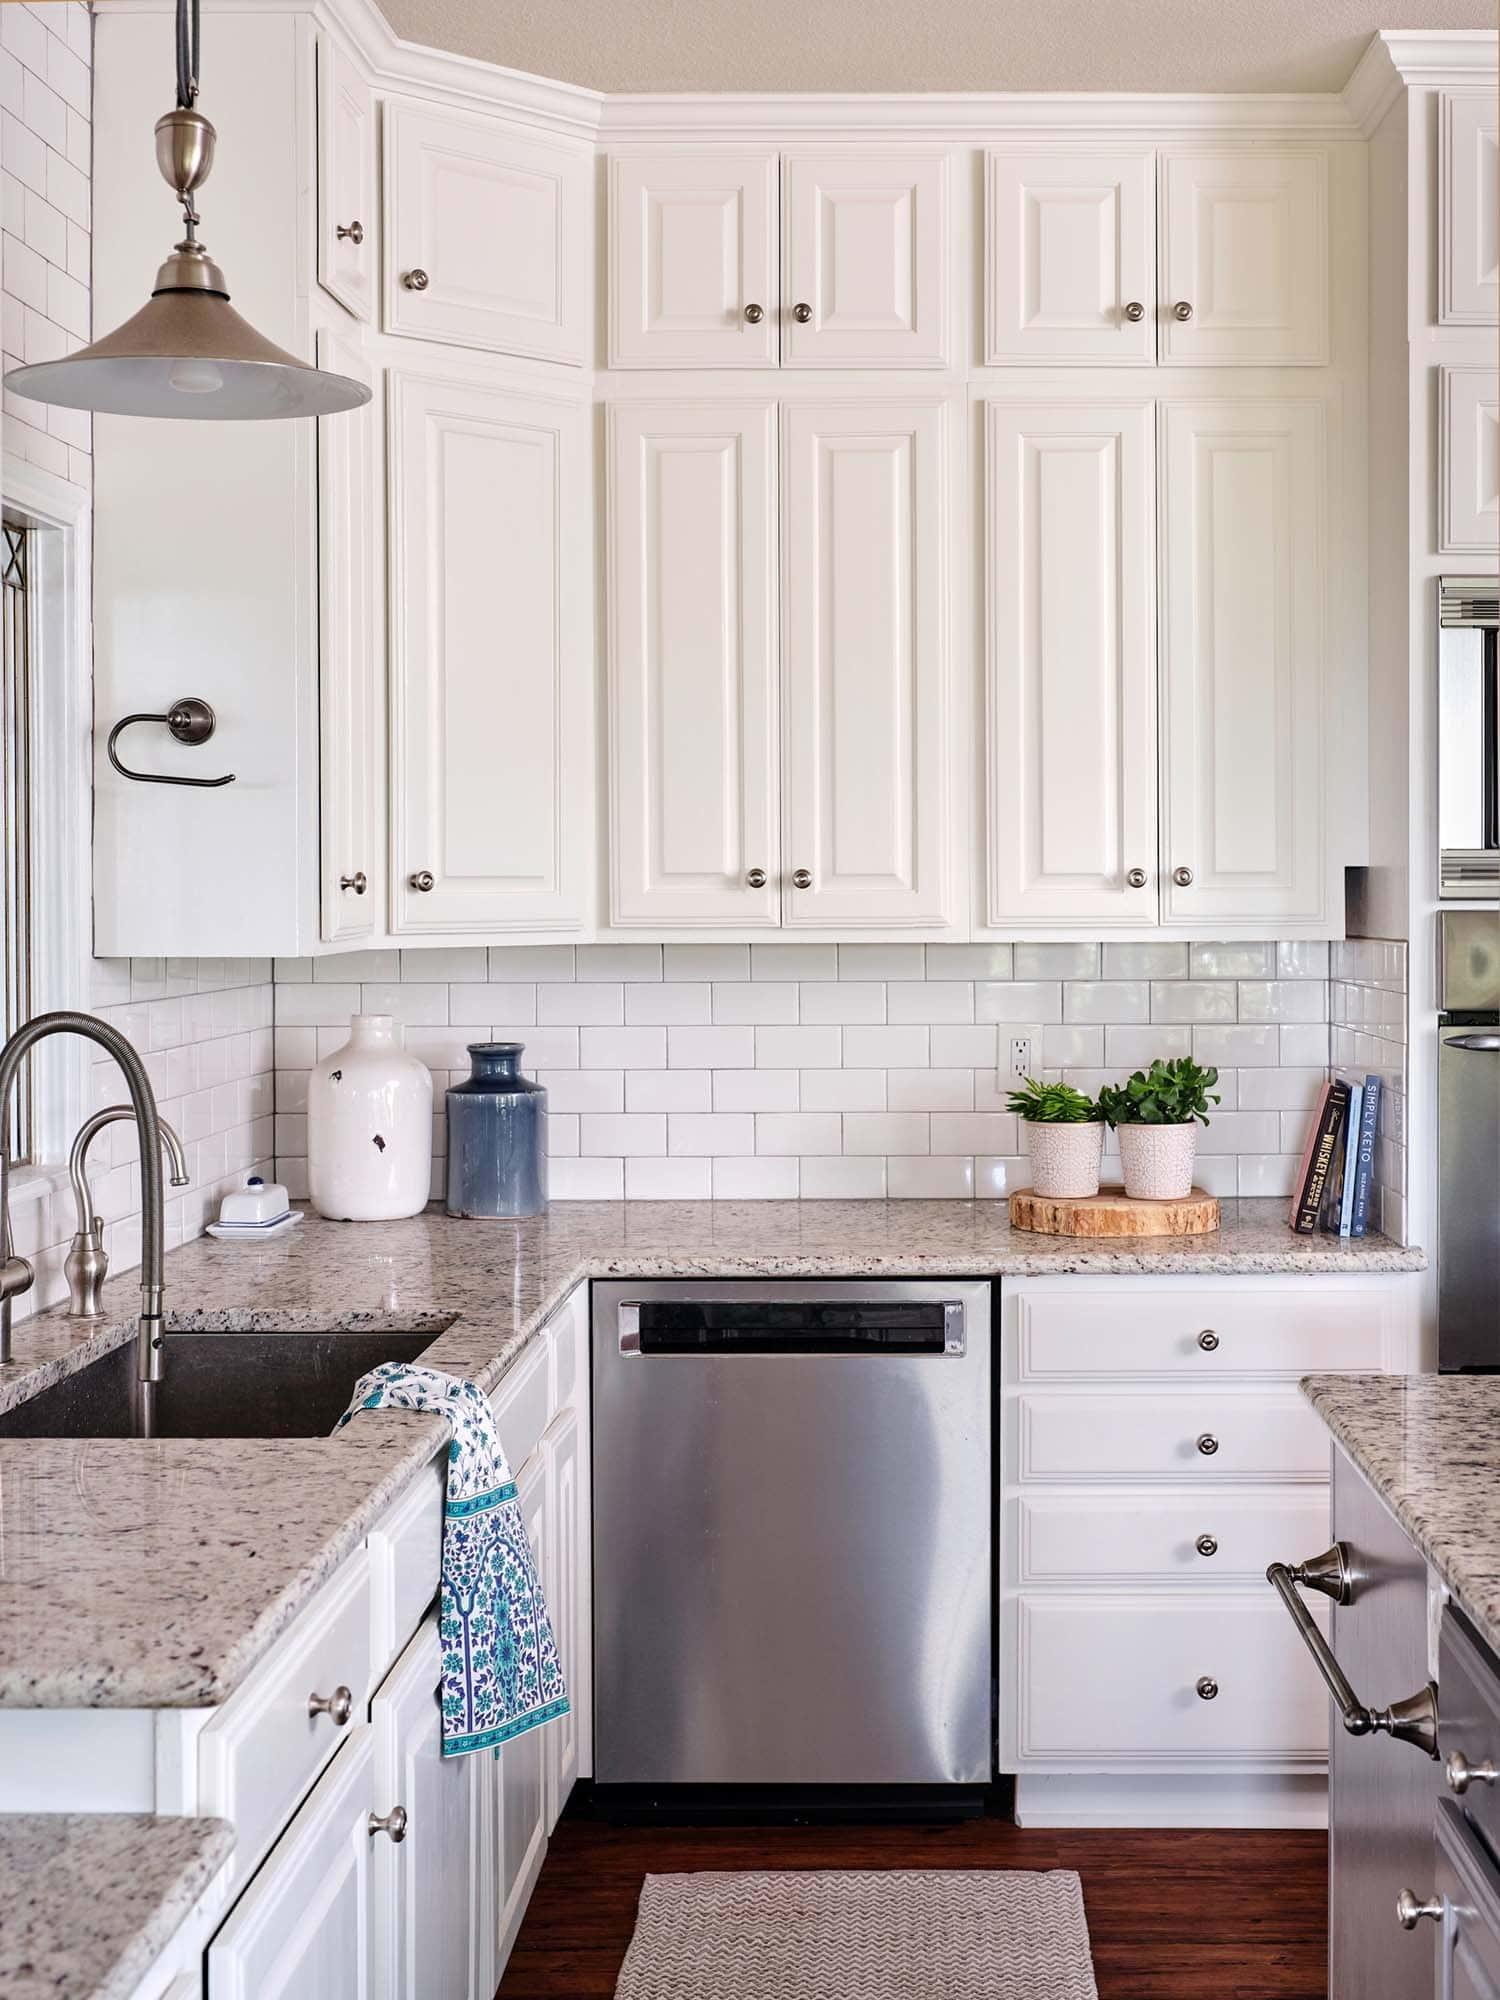 Kitchen cabinets painted in Benjamin Moore Cloud White and Tweed Coat, Paper Moon Painting San Antonio TX